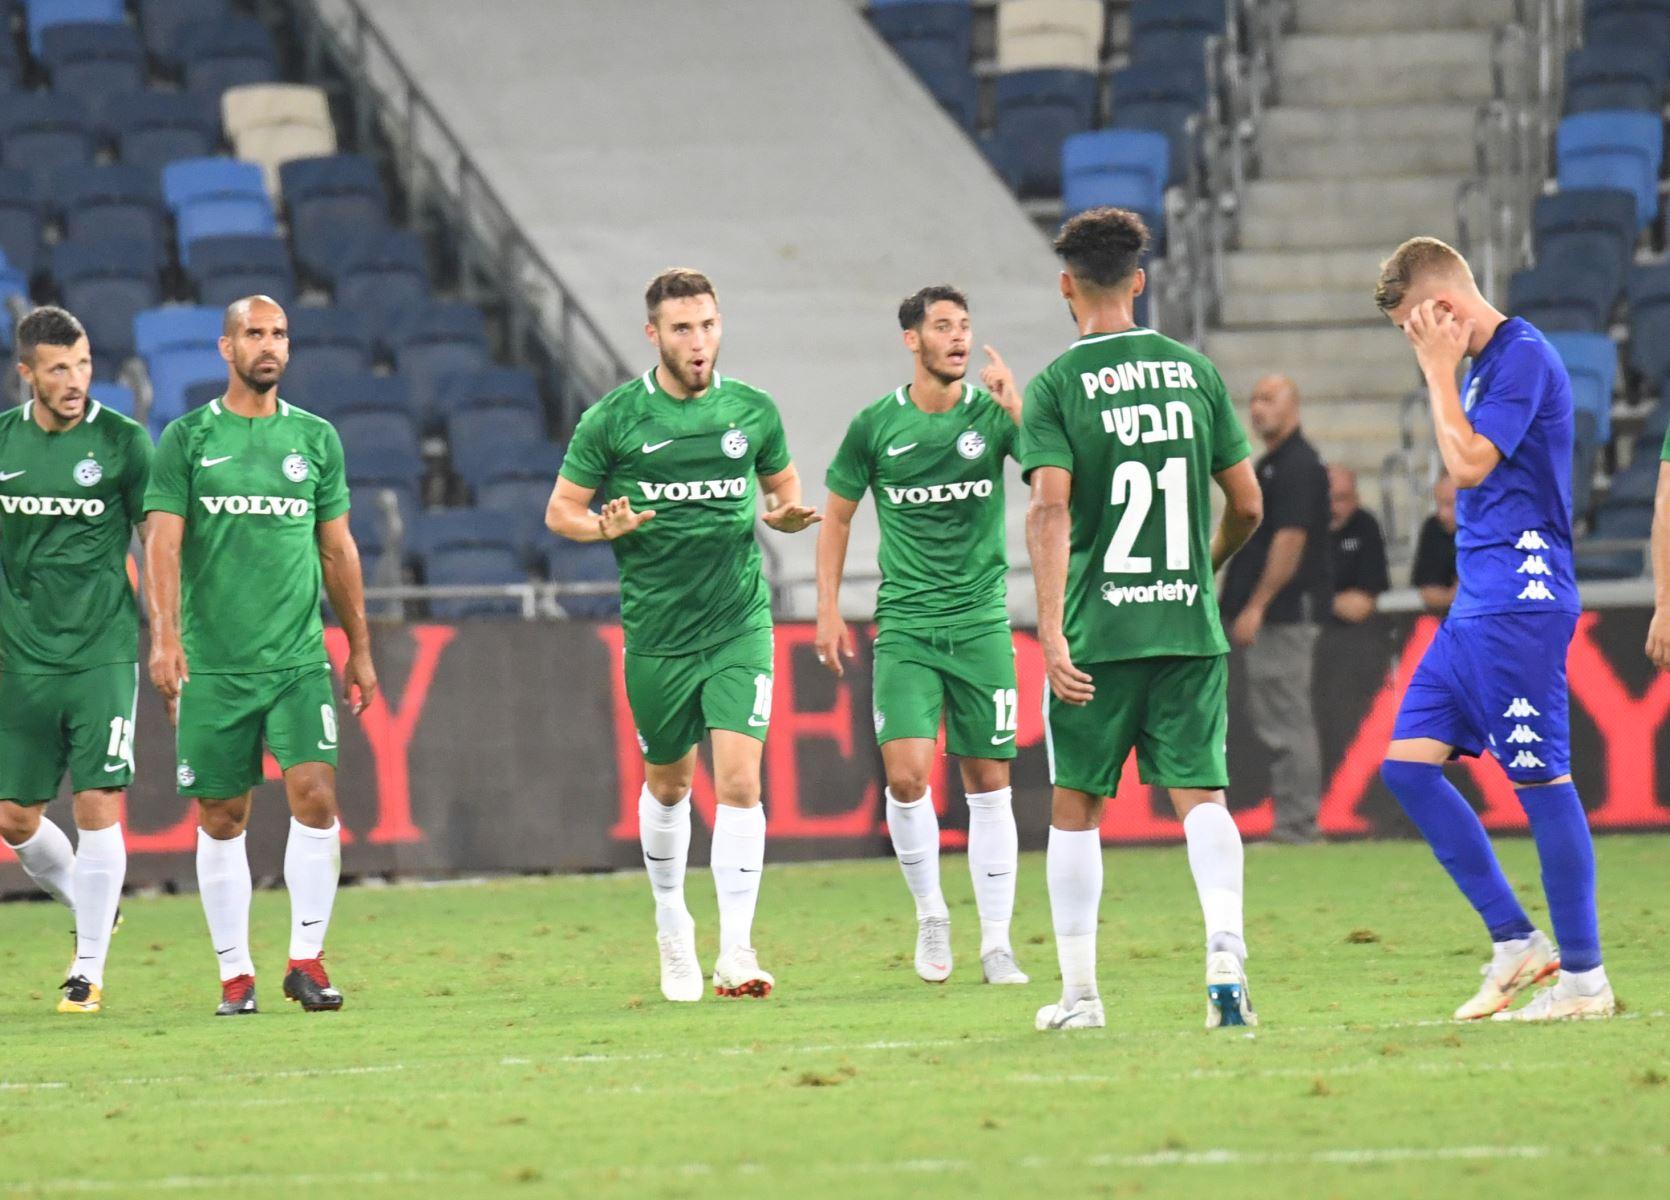 Maccabi verslaat Ironi Kiryat Shmona met 3-2